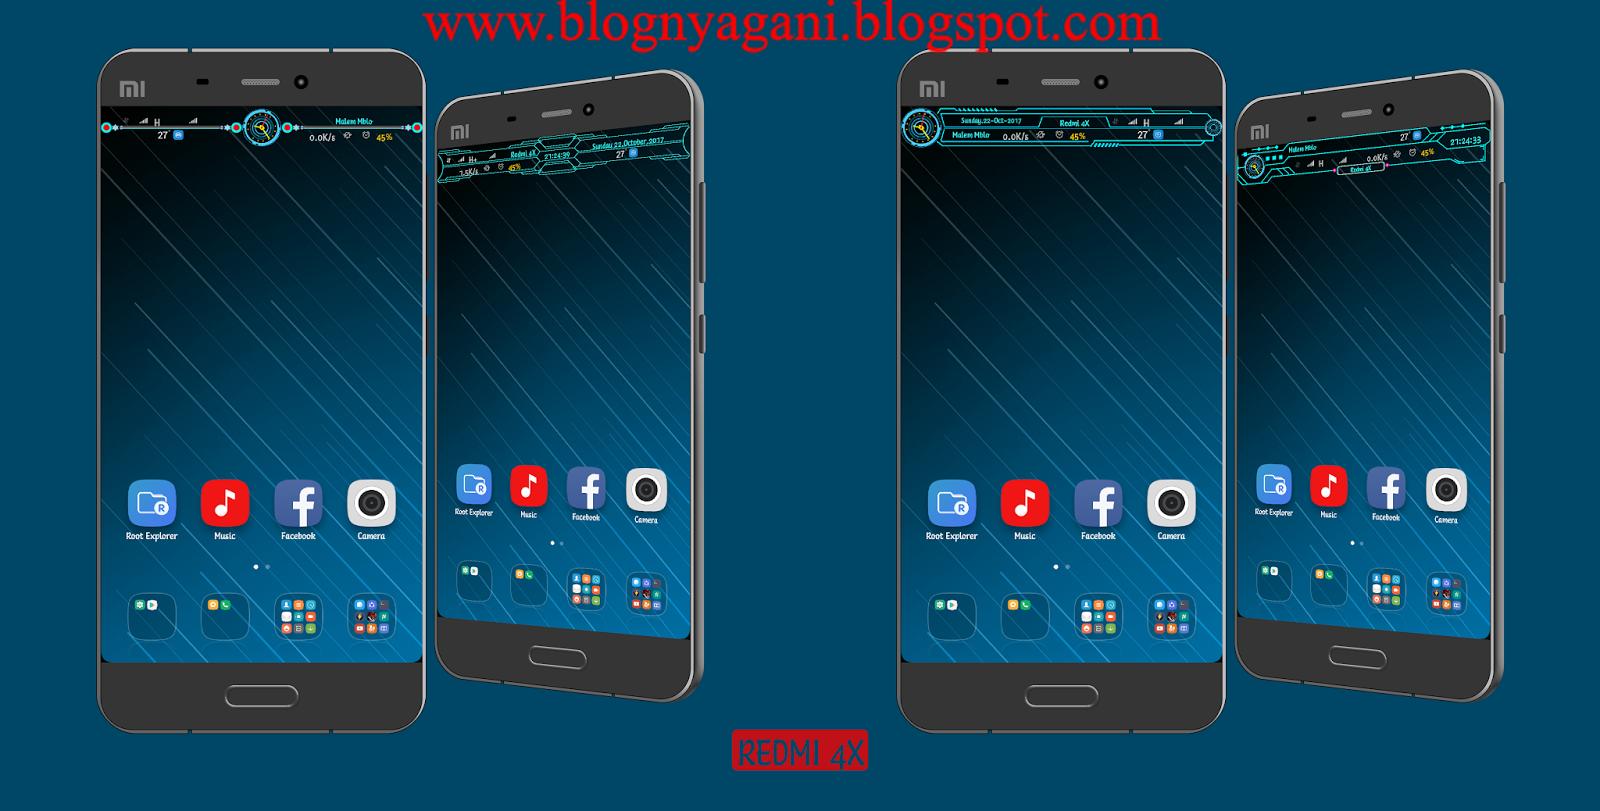 Cara Mod StatusBar Xioami Redmi 4x/4x Prime (SANTONI) MiuiPro 7 11